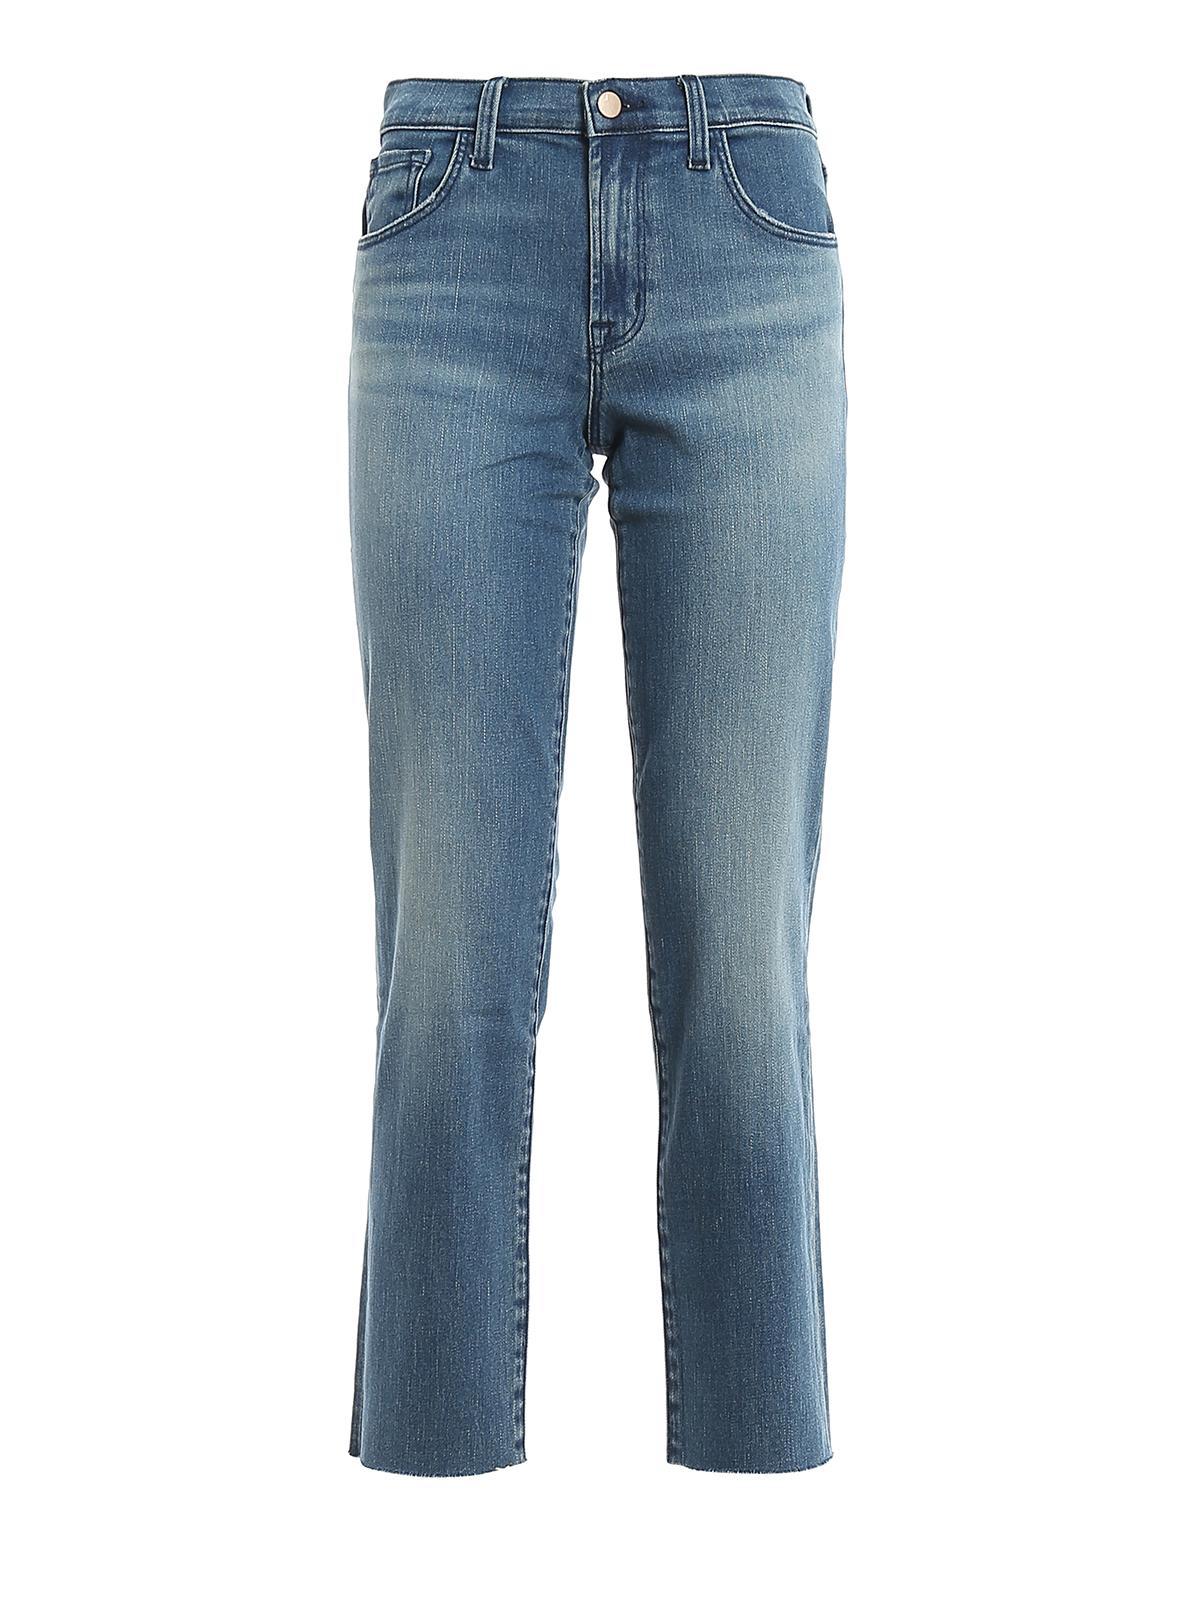 J Brand Straight jeans ADELE JEANS